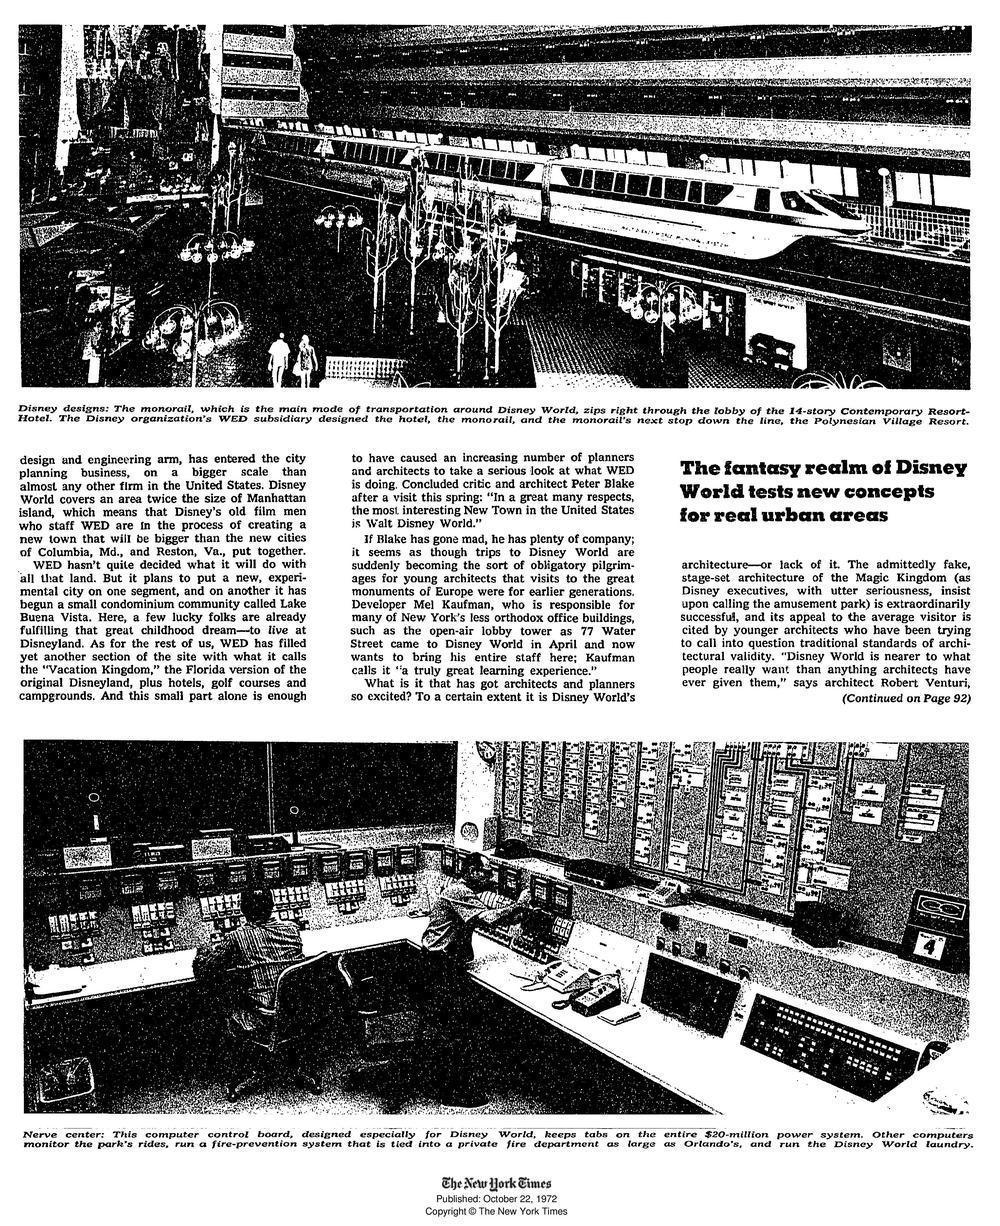 wdw1972-page-002.jpg